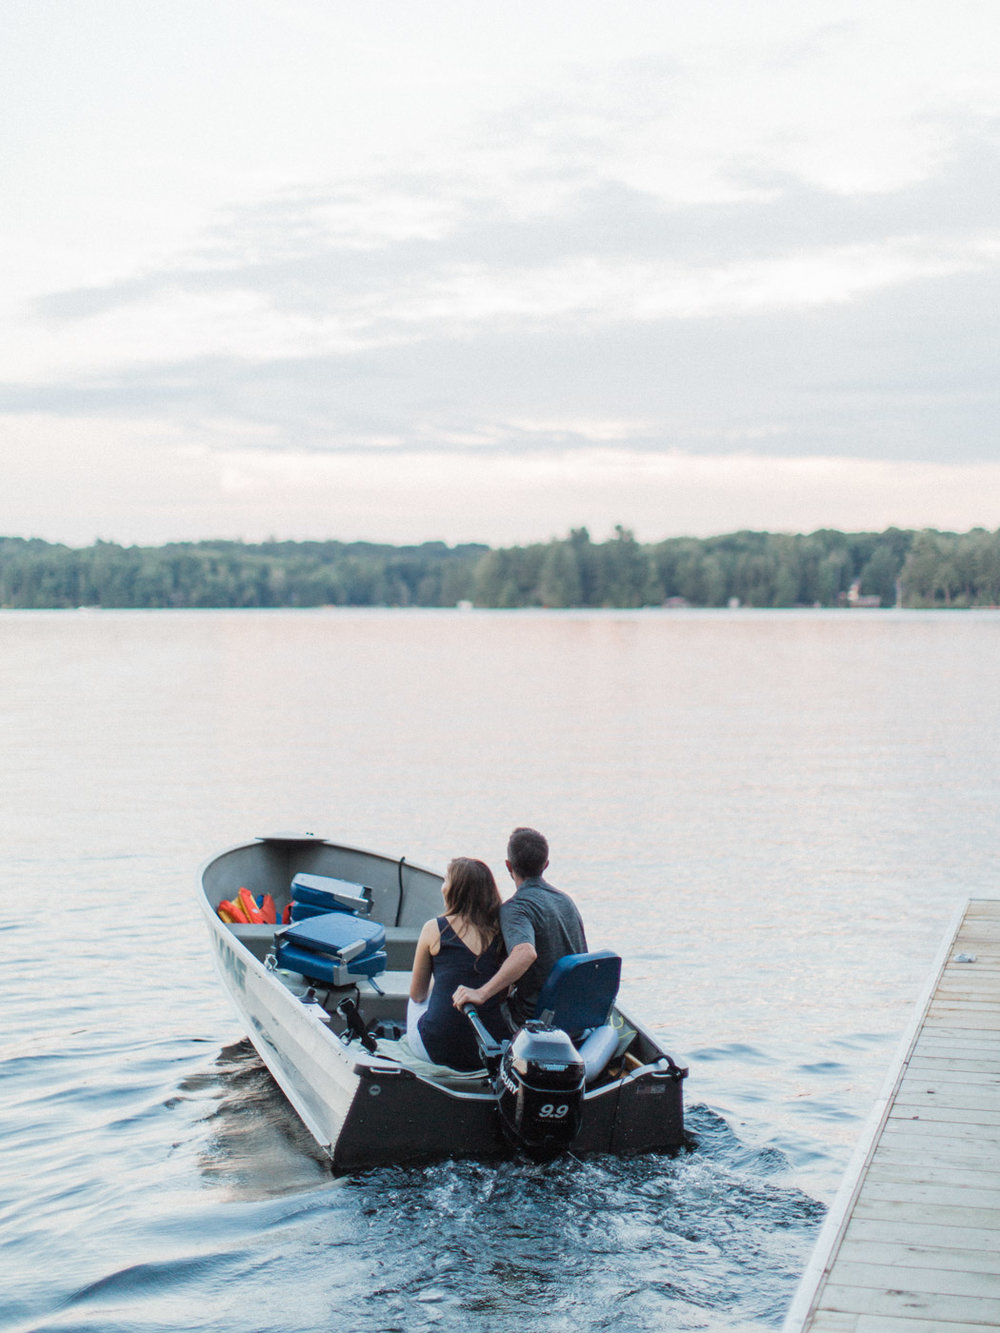 muskoka-wedding-photographer-adventurous-couples-engagement-session-lake-98.jpg